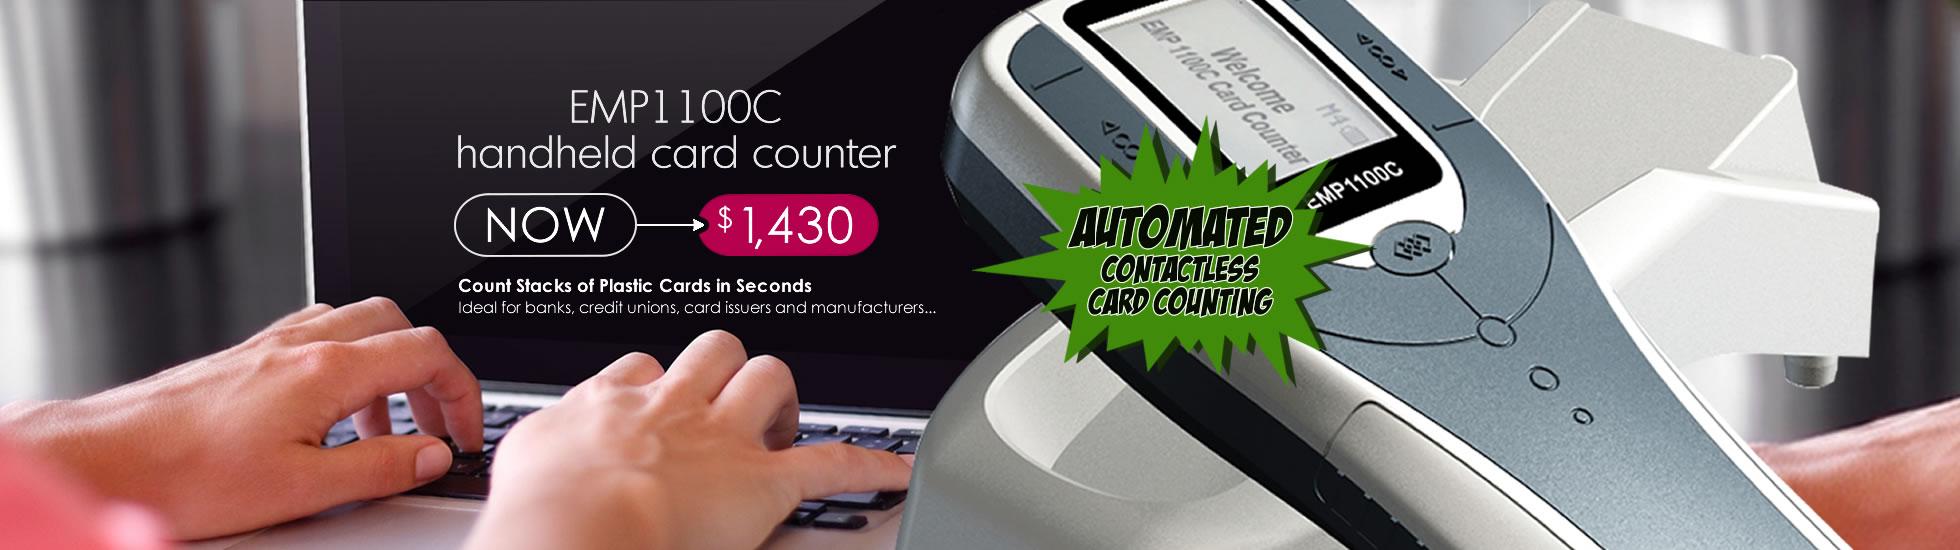 EMP1100 Handheld Card Counter